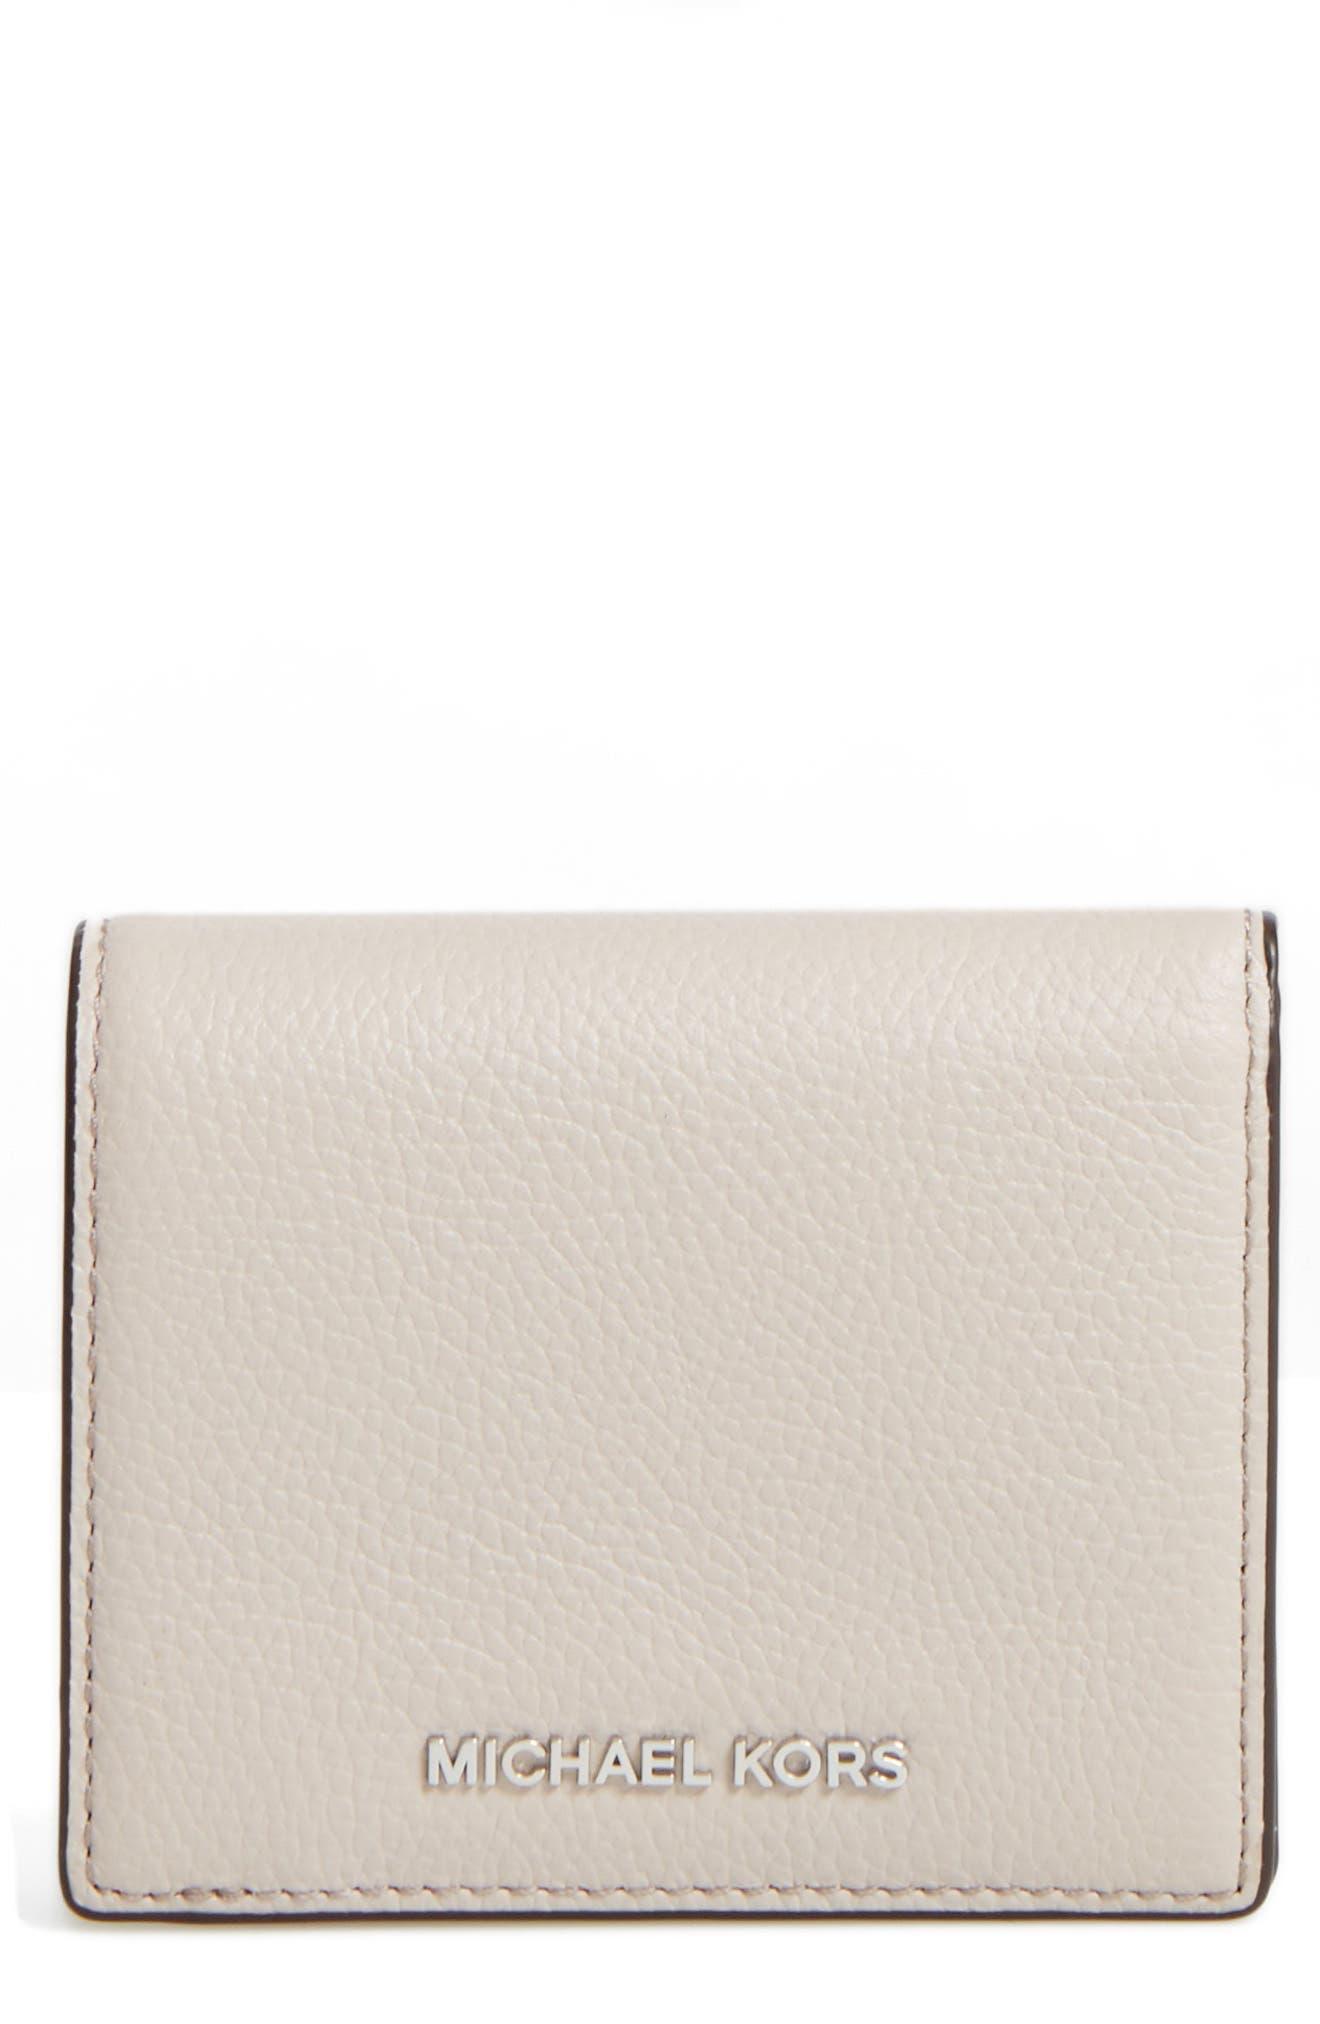 Mercer Leather RFID Cardholder Wallet,                             Main thumbnail 1, color,                             292